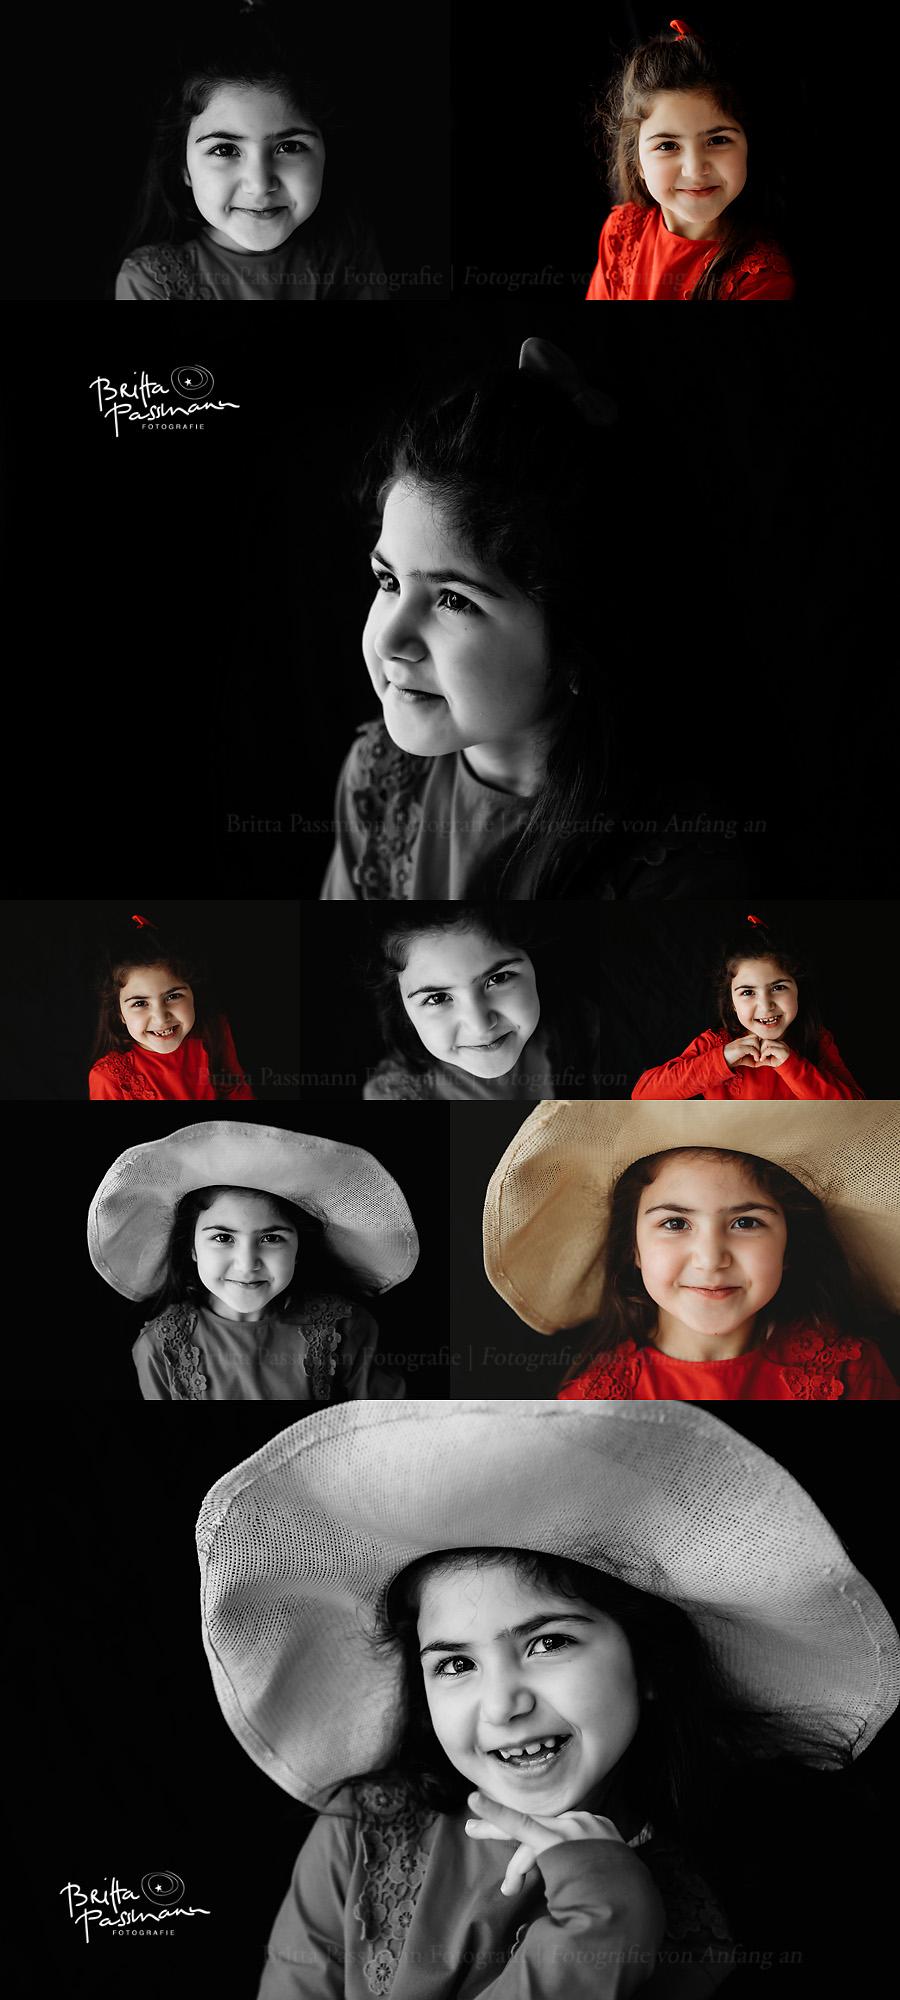 Kinderfotos-Dortmund-Fotoshooting-Kinderportät-Fineart-Bochum-Fotostudio